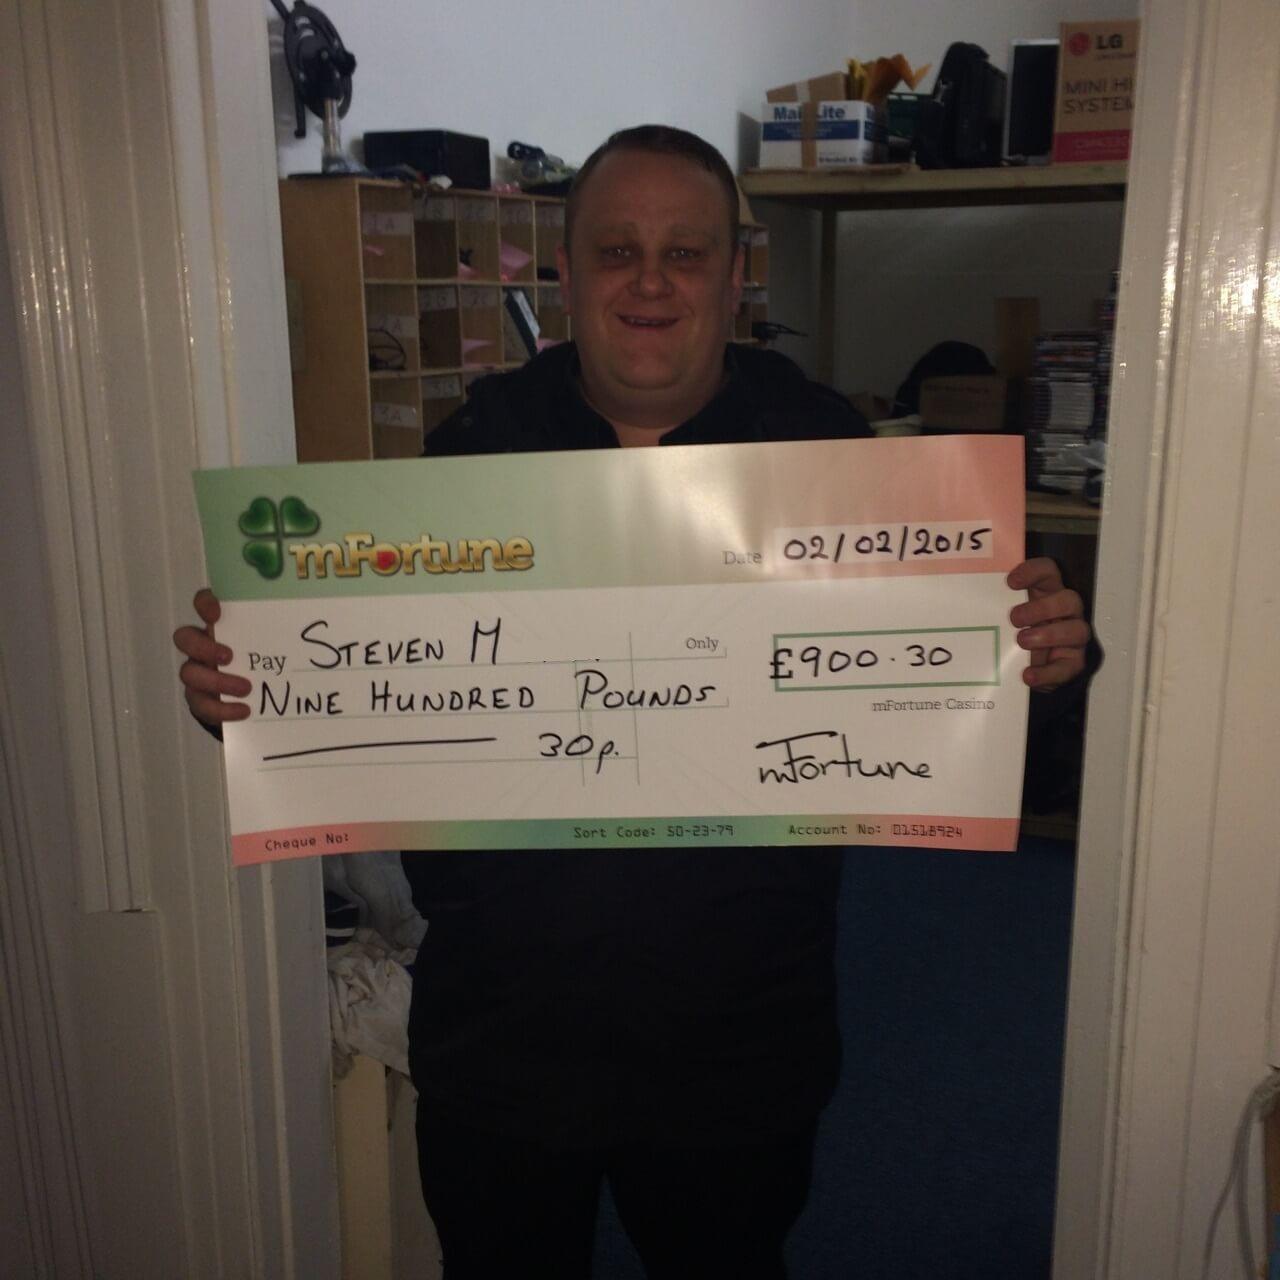 Steven M won £ 900